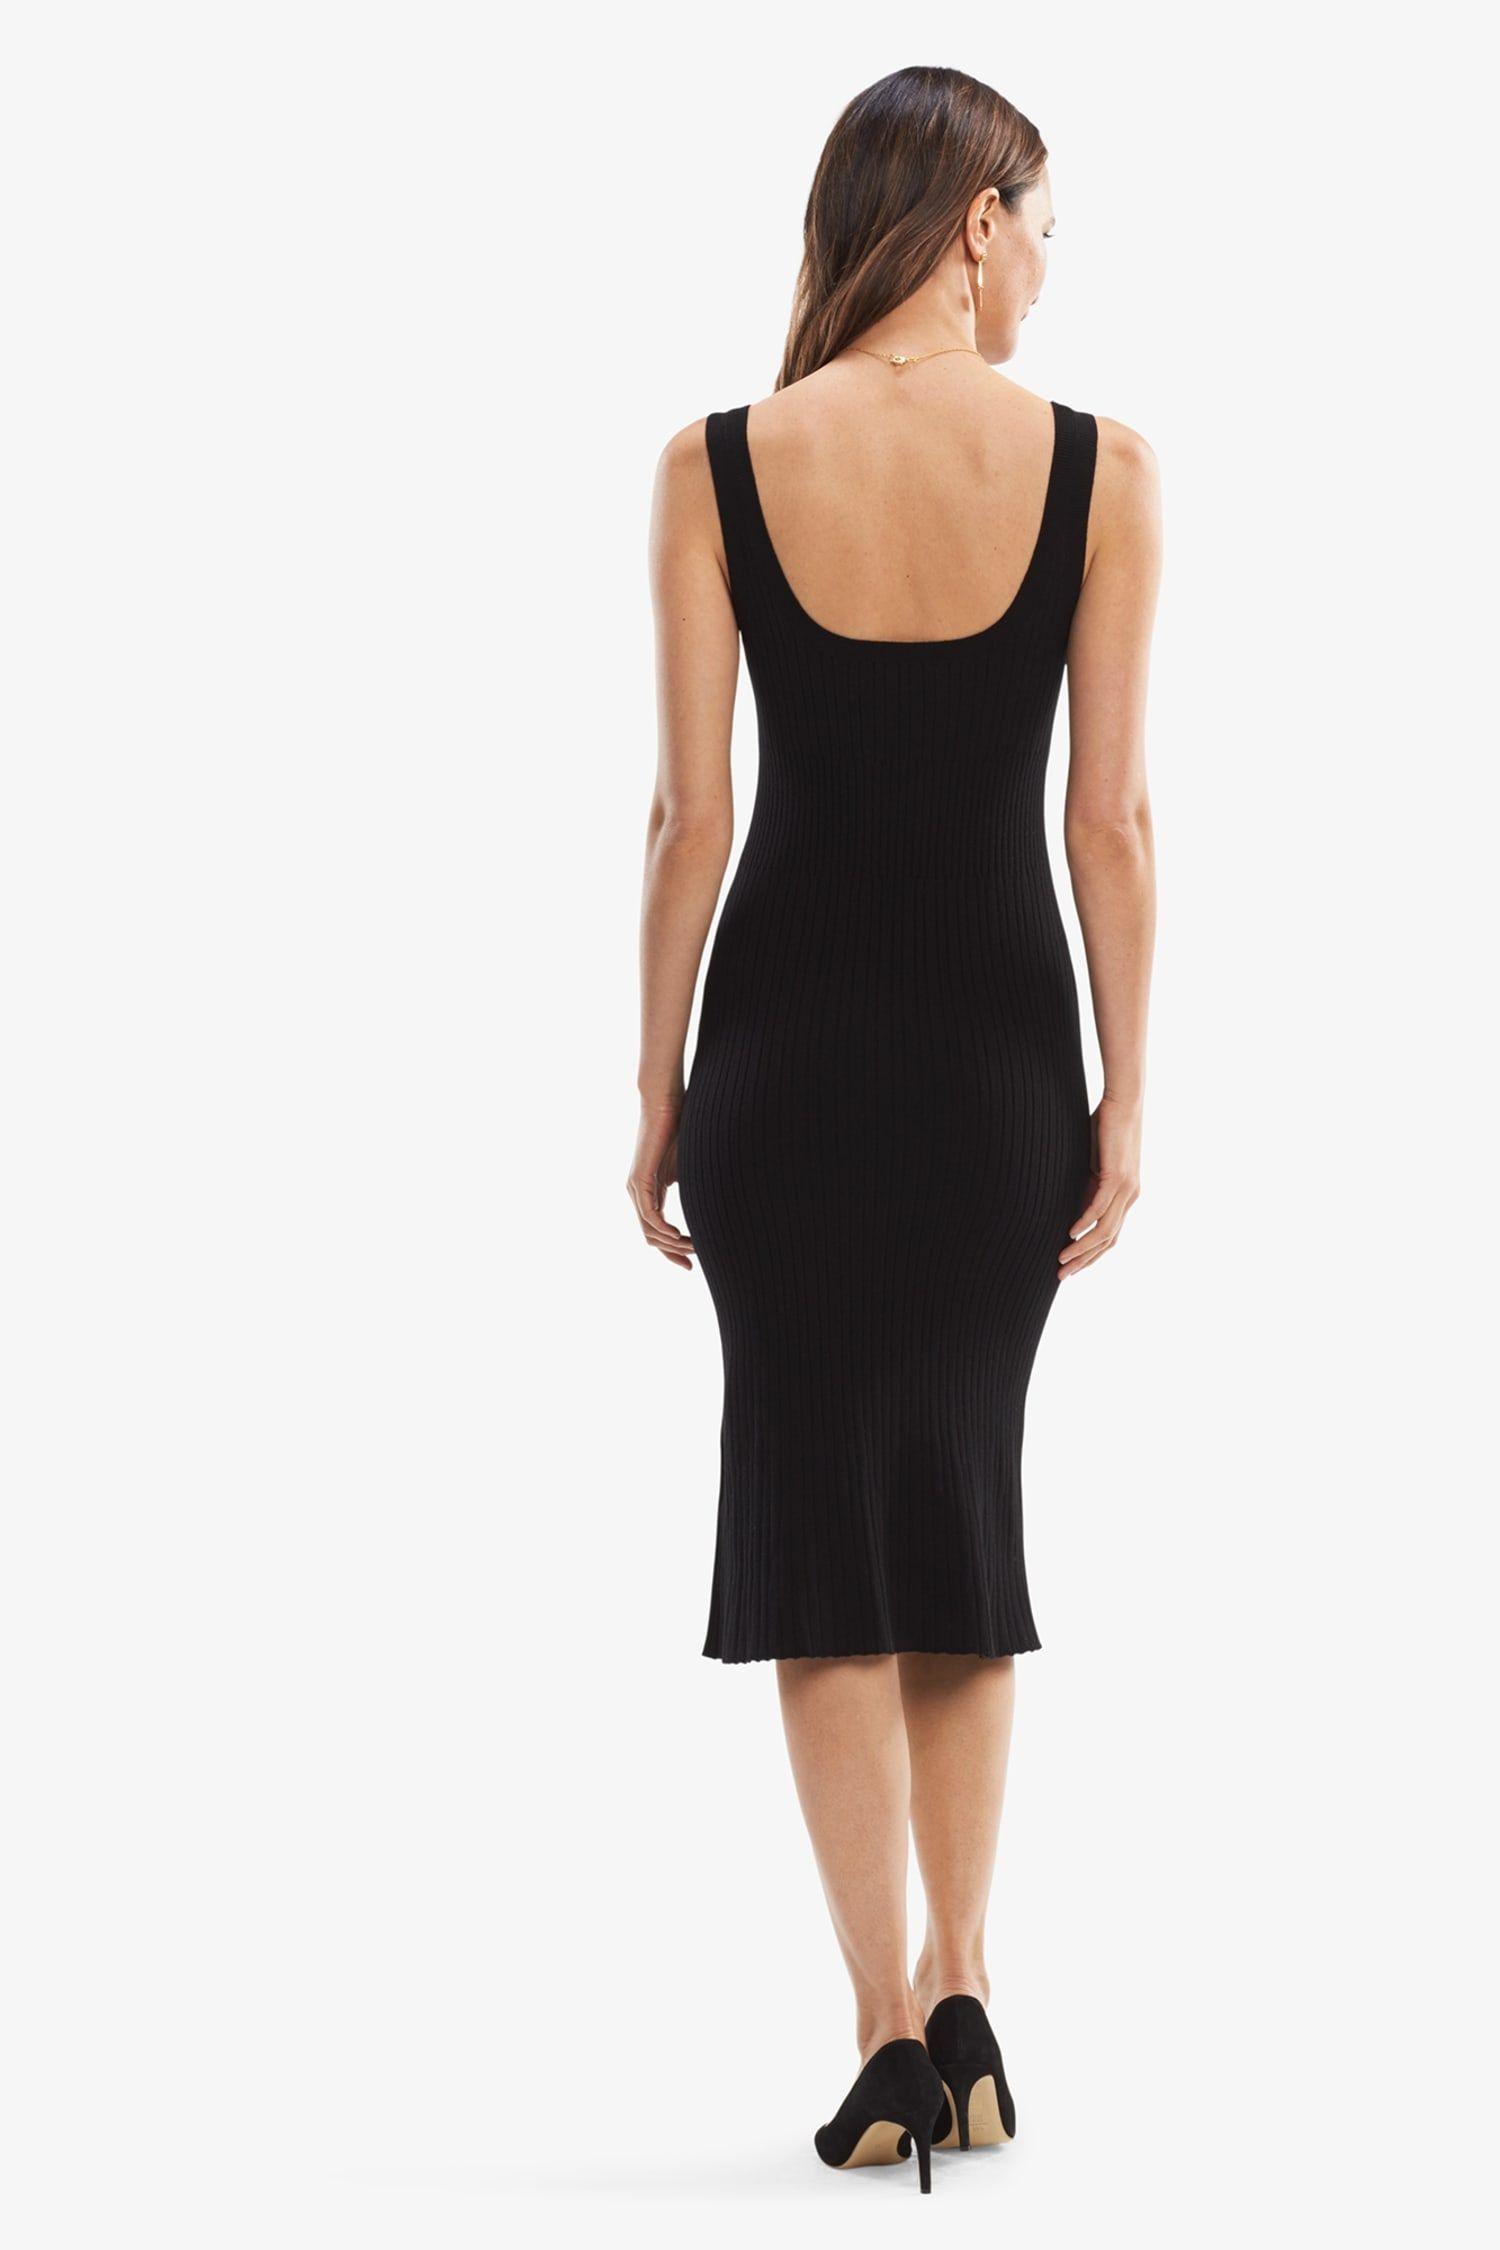 Dinner fancy dress black forecast dress in autumn in 2019